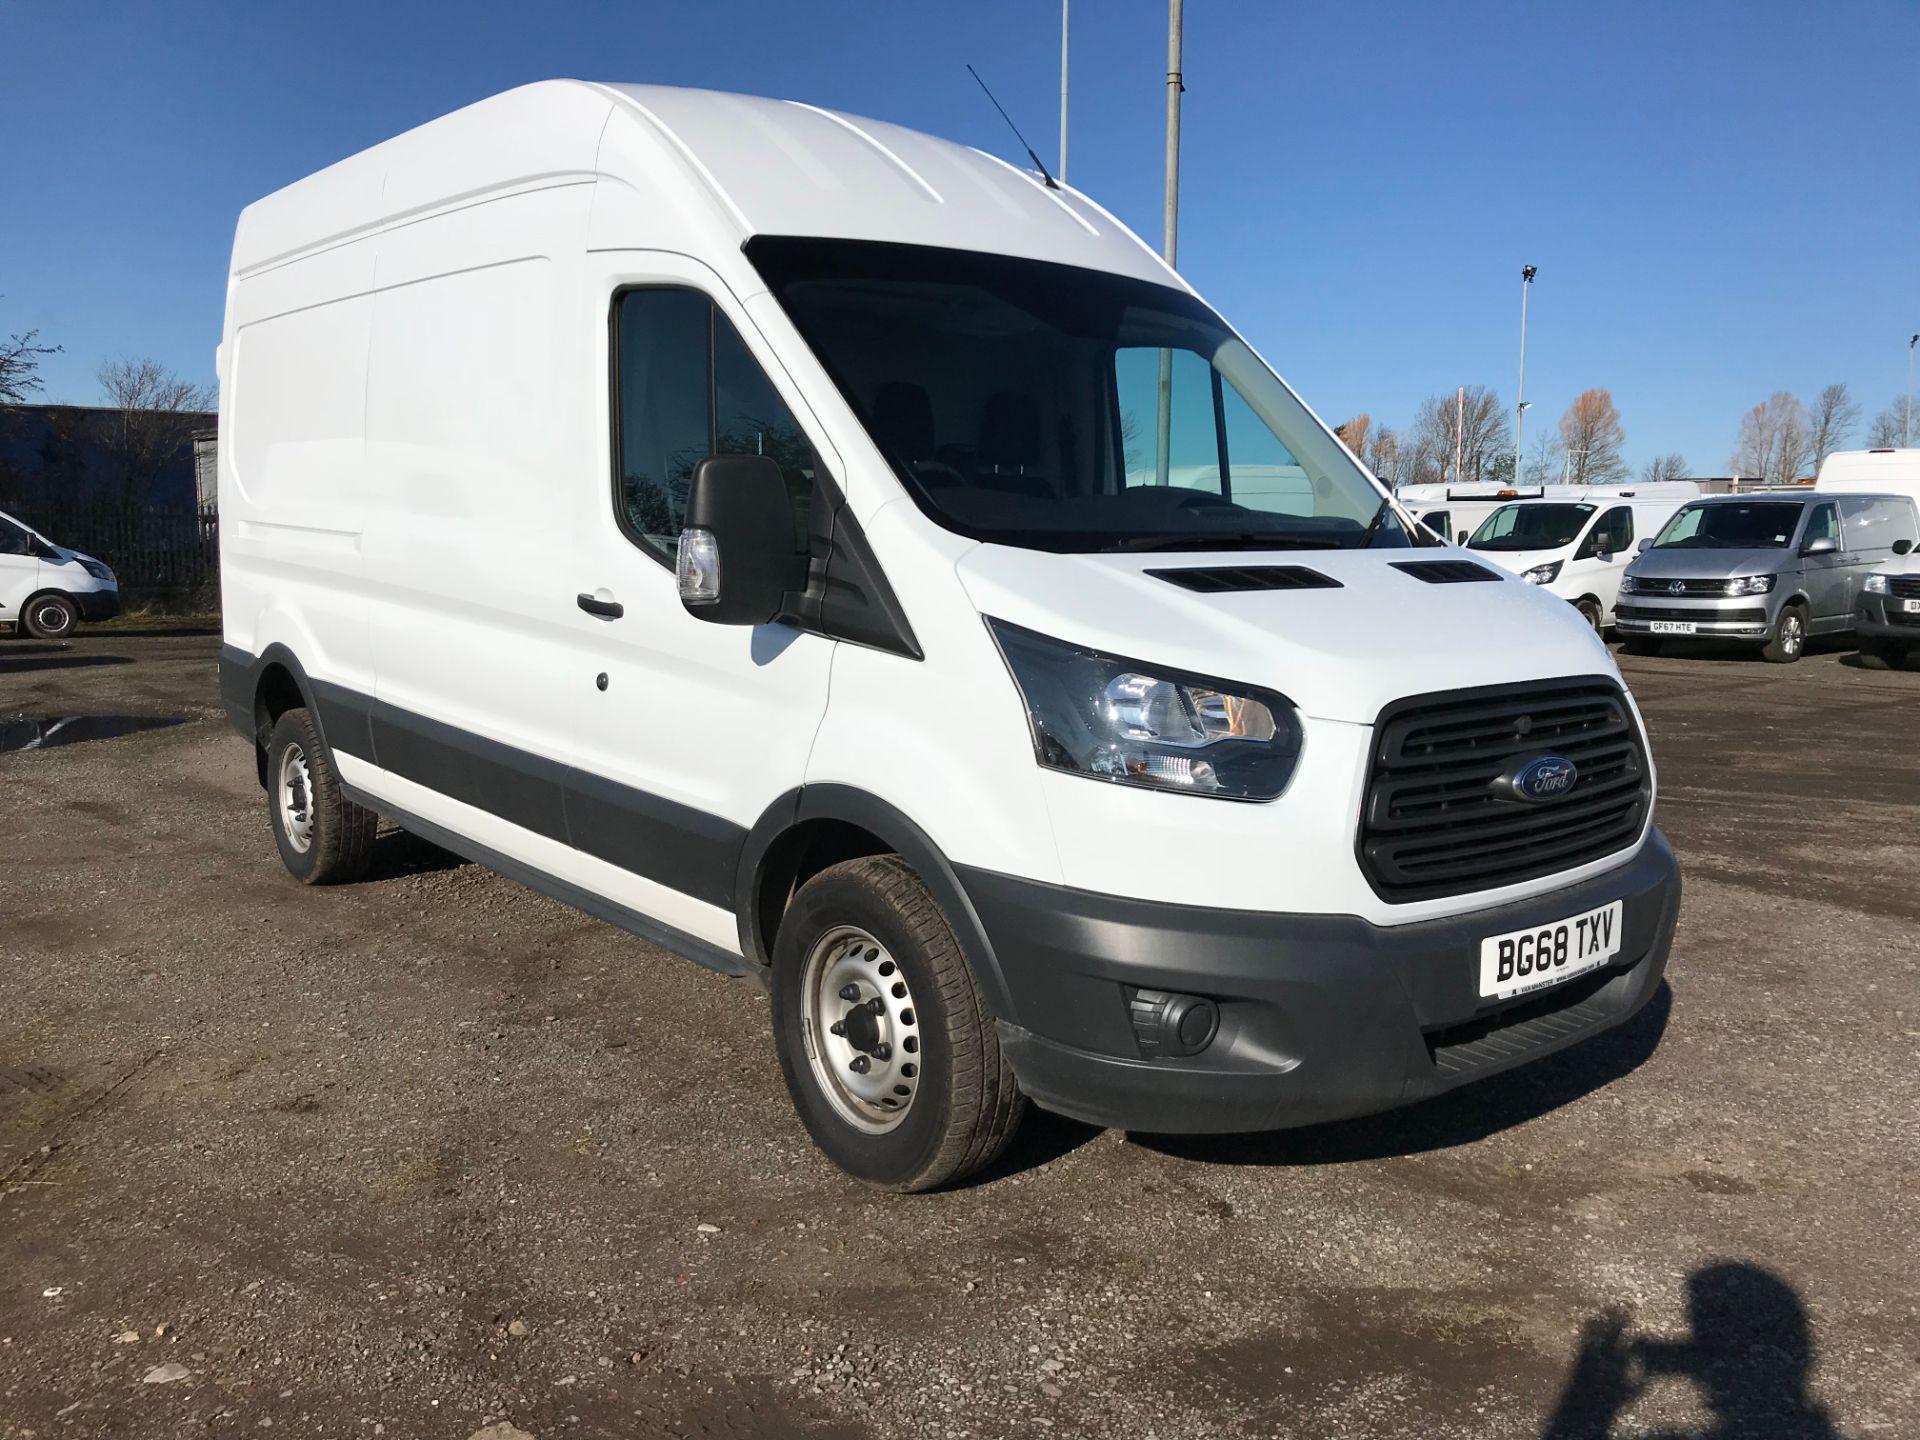 2018 Ford Transit 2.0 Tdci 130Ps H3 Van (BG68TXV)